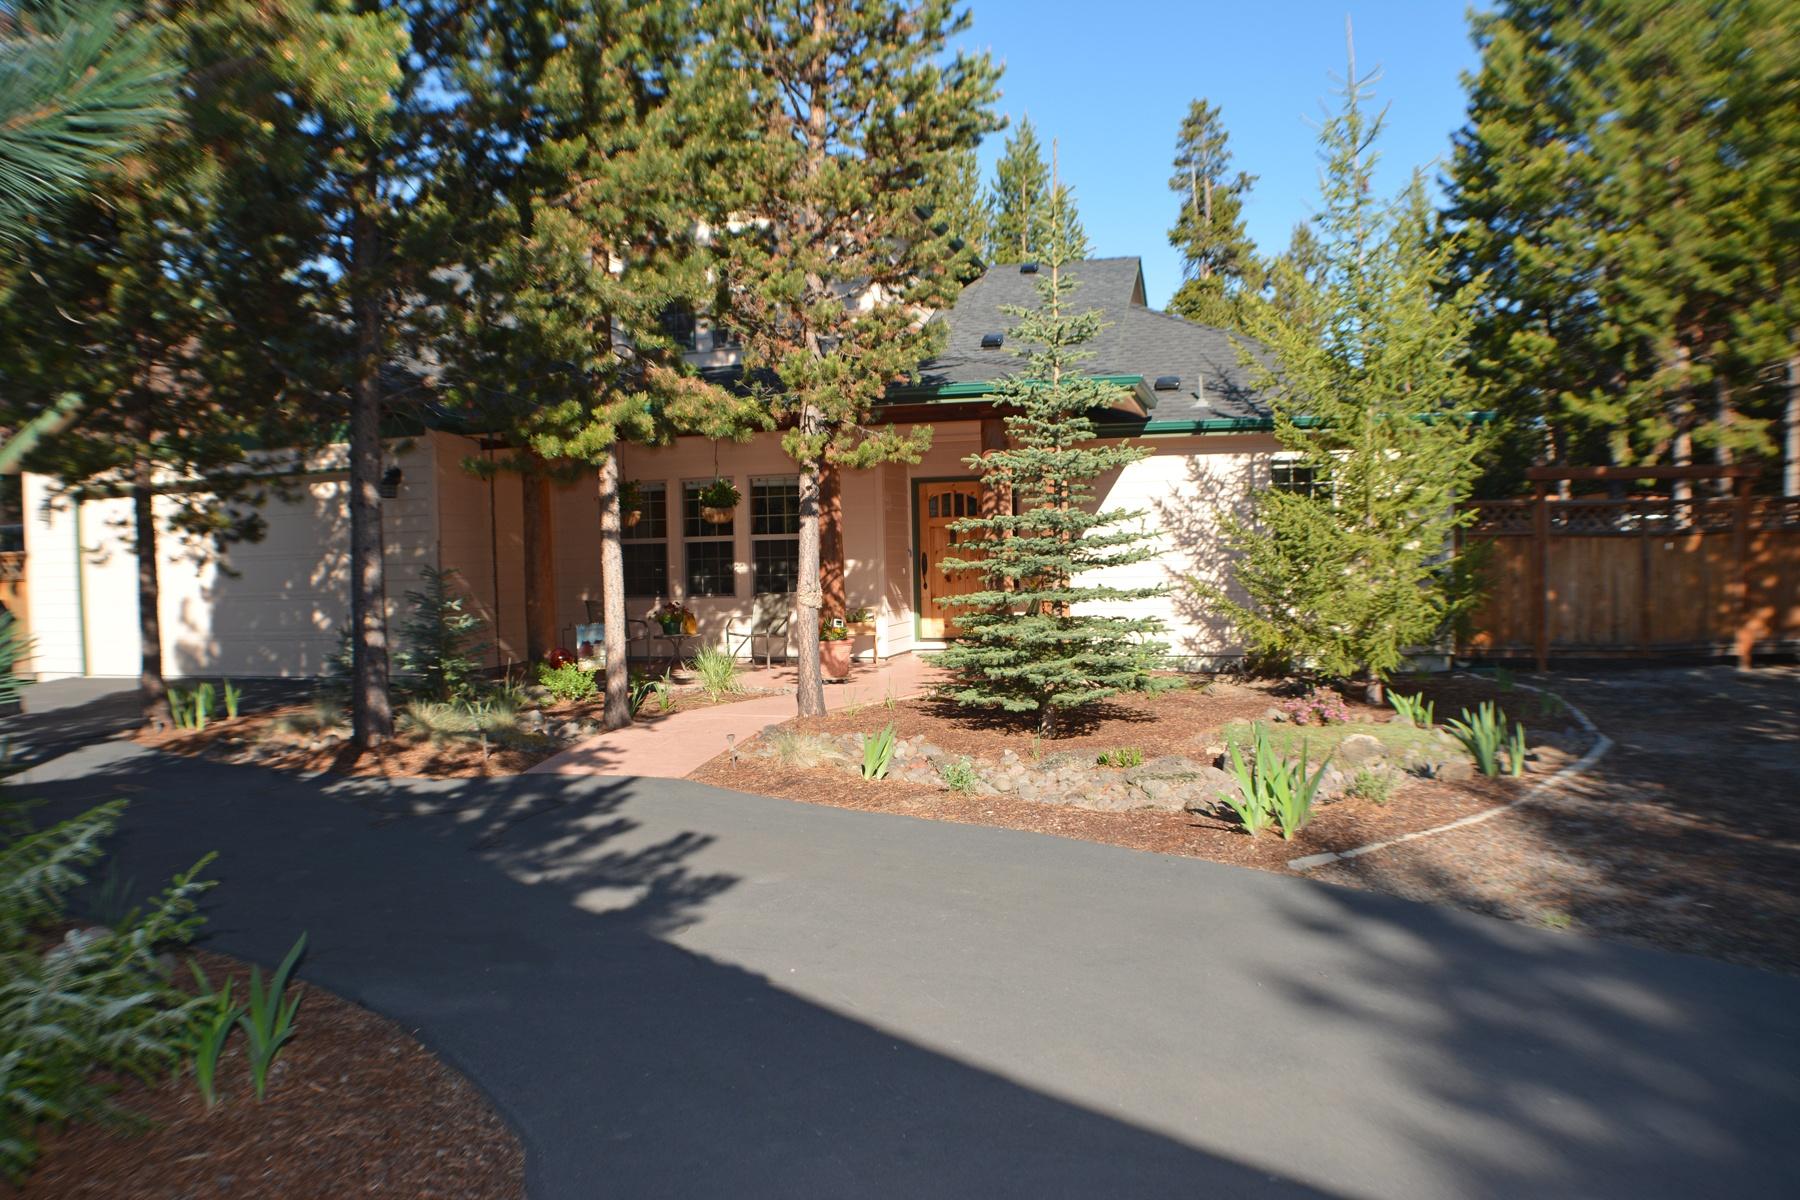 Moradia para Venda às 55883 Wood Duck Drive Bend, Oregon 97707 Estados Unidos